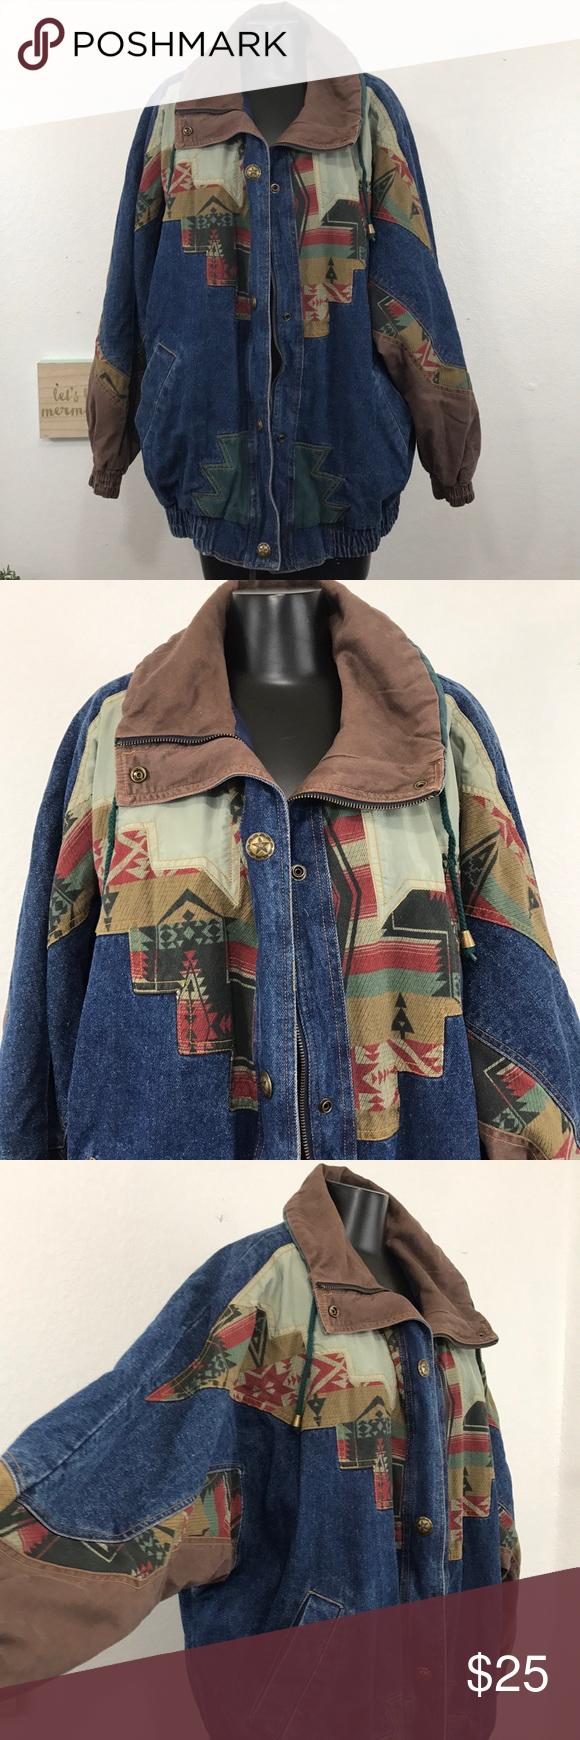 Vintage Genuine Izzi Jean Denim Jacket Size Large Denim Jacket Jackets Clothes Design [ 1740 x 580 Pixel ]